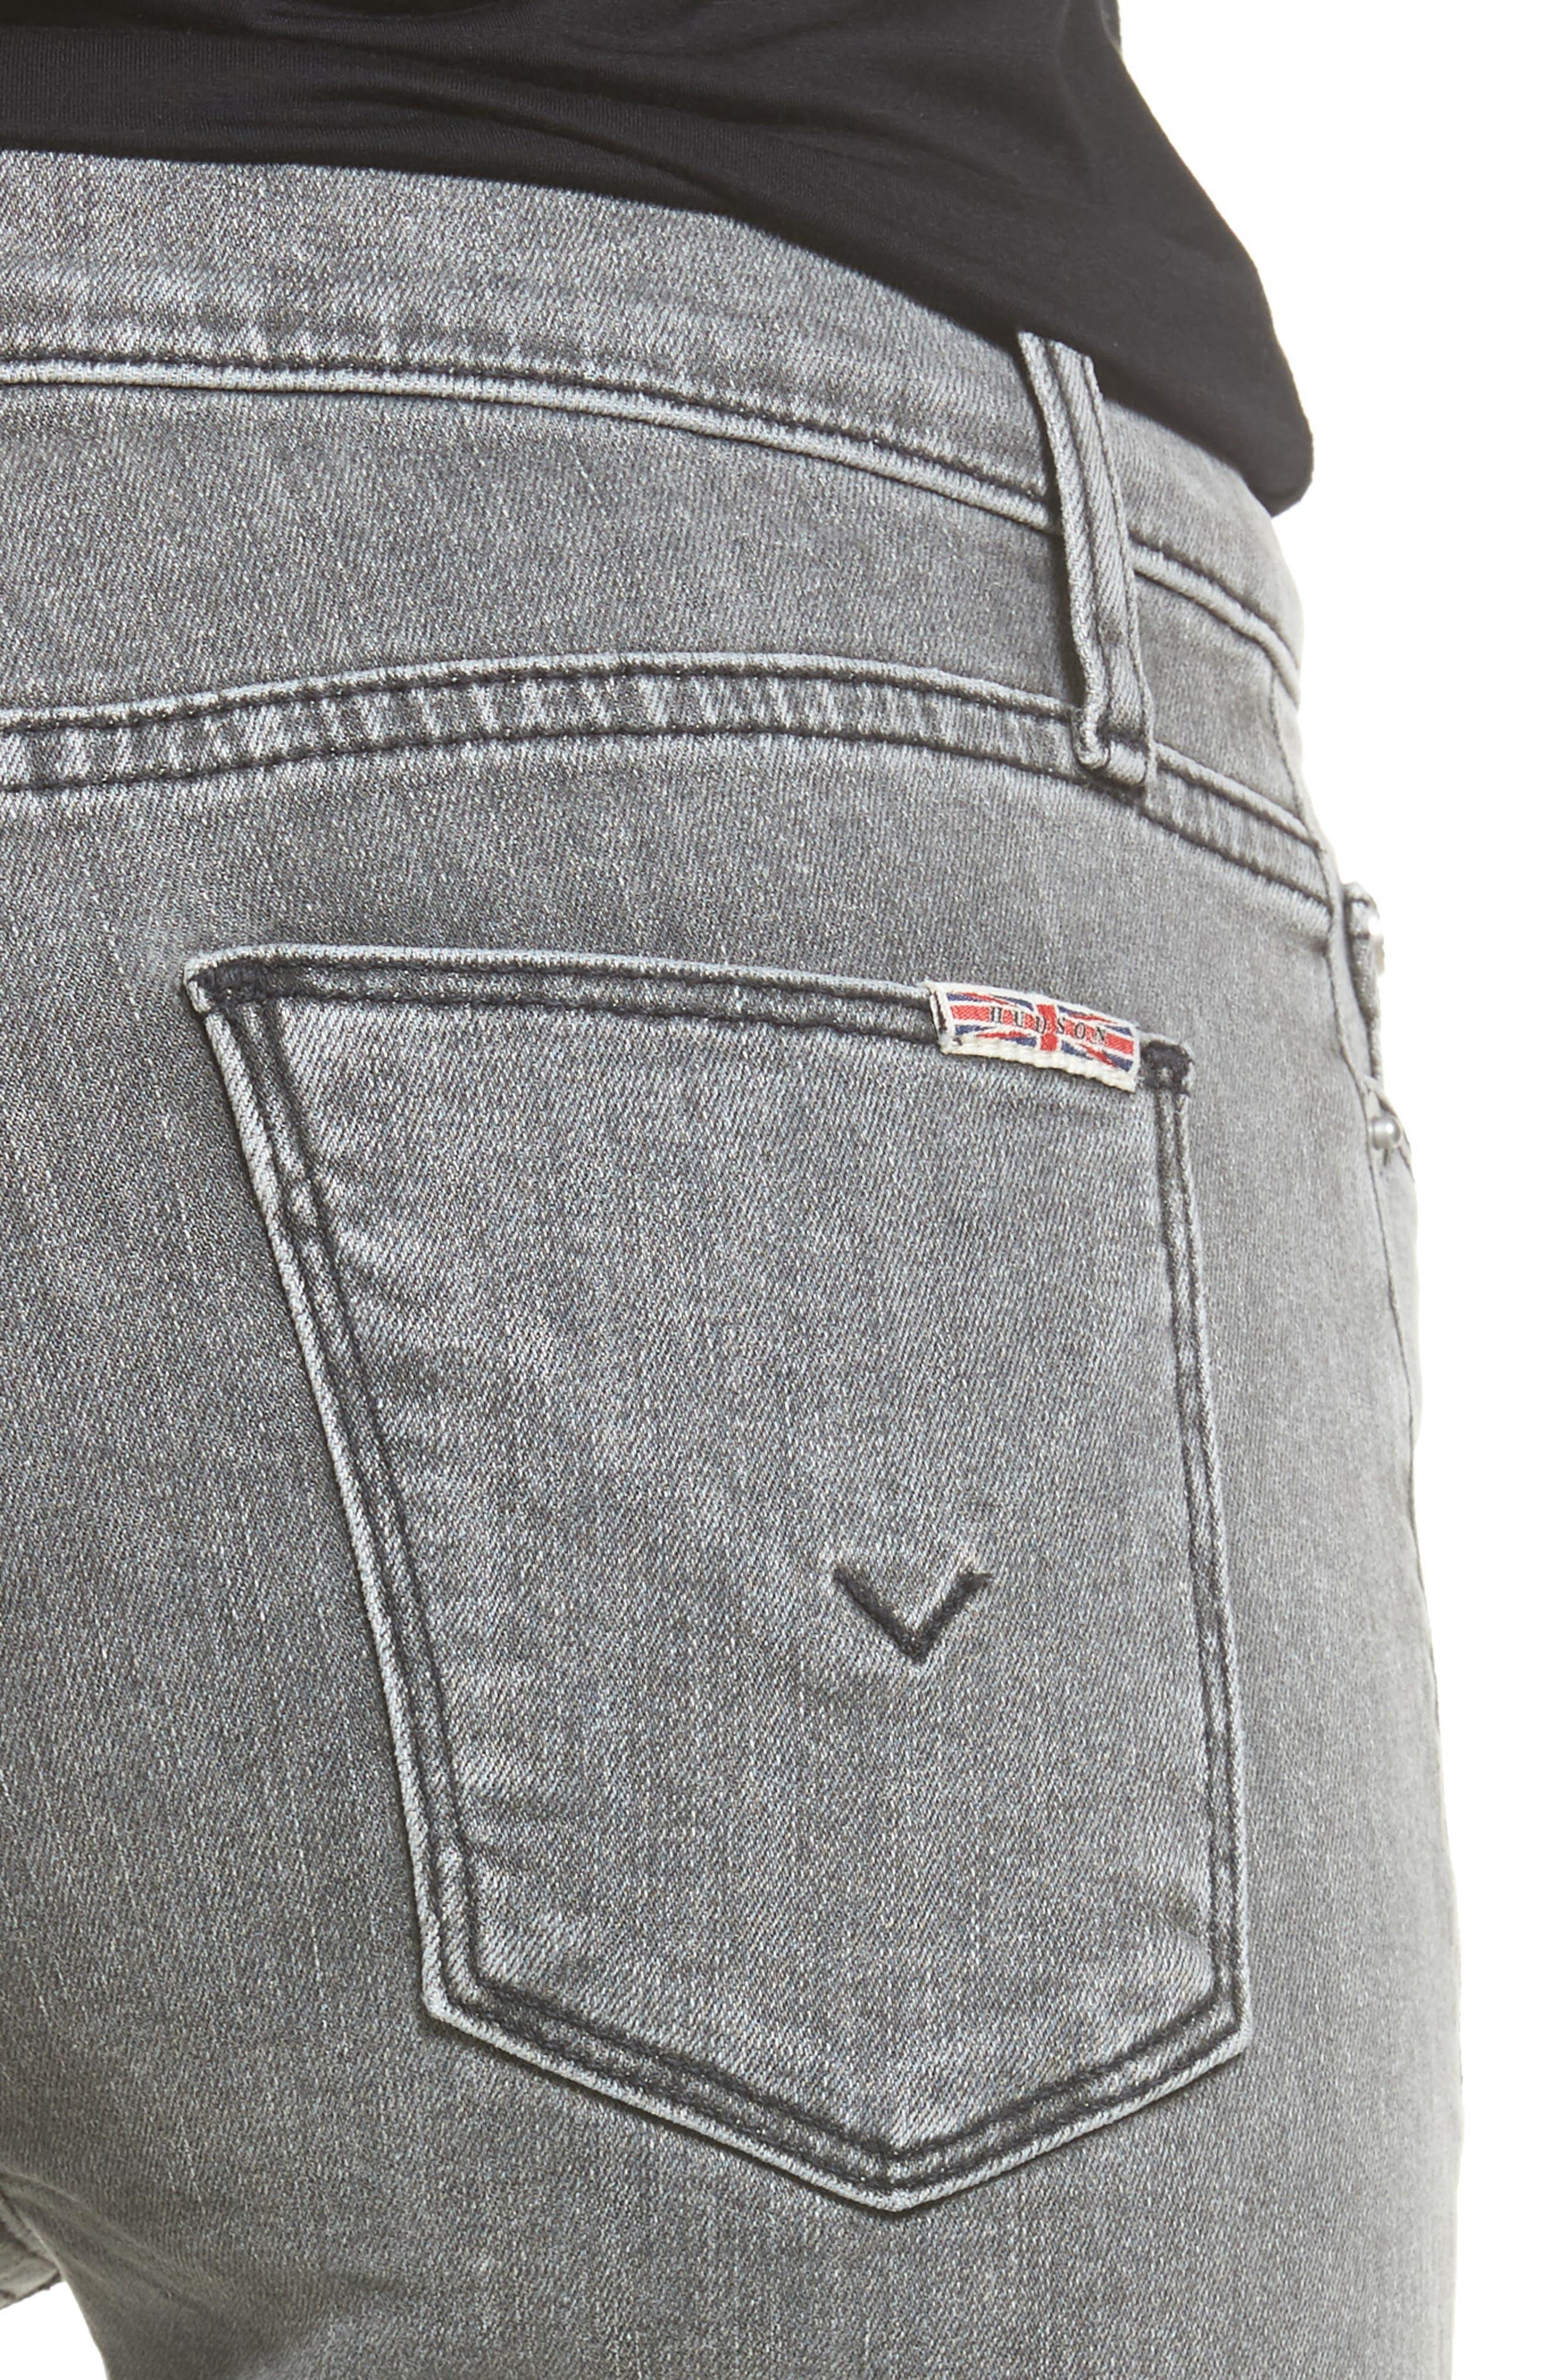 Hudson Nico Ankle Super Skinny Jeans,                             Alternate thumbnail 4, color,                             063